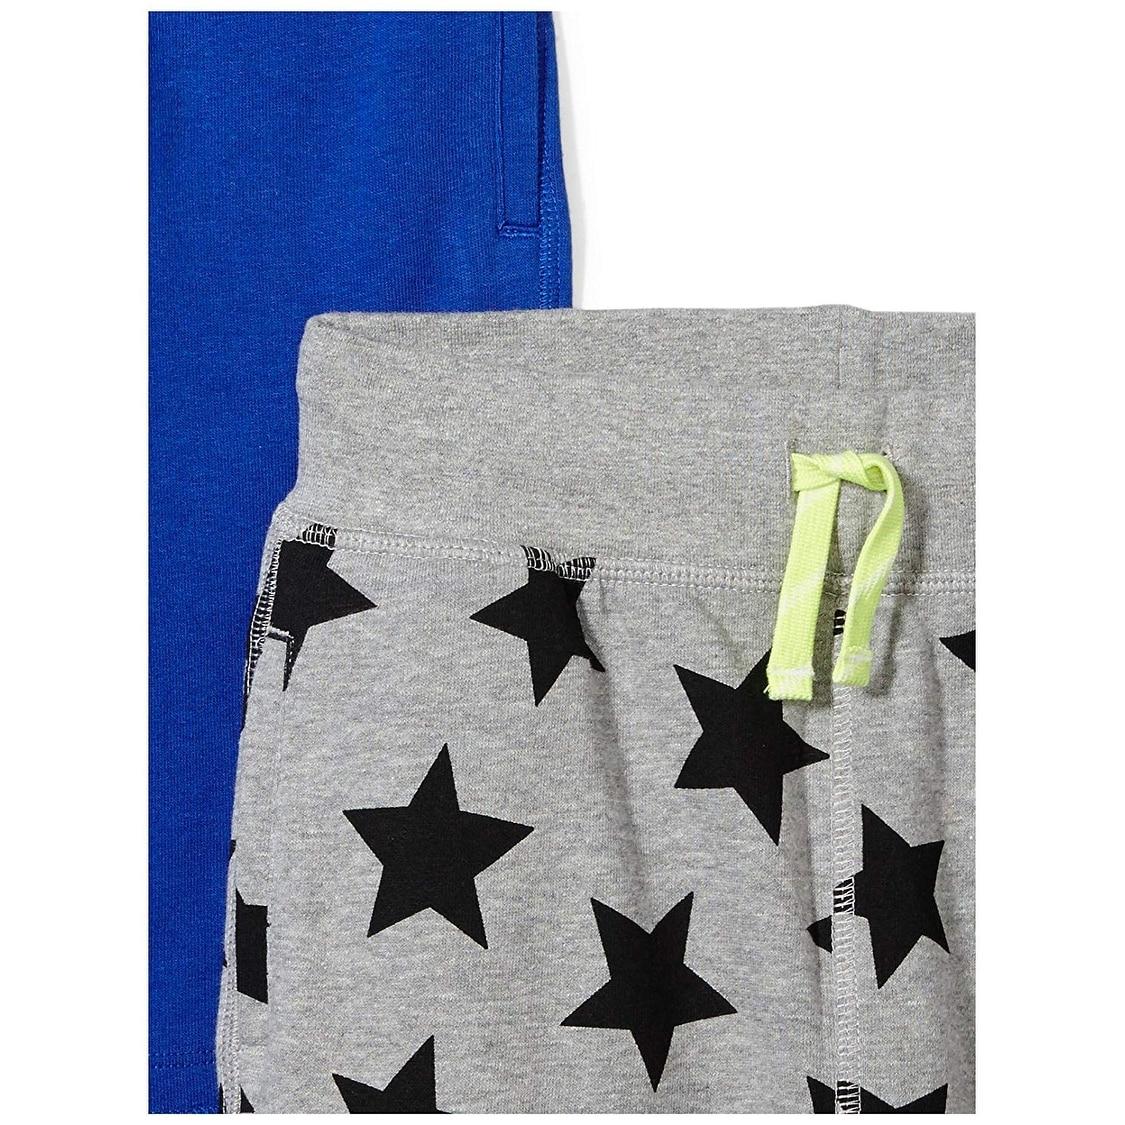 Brand Spotted Zebra Girls French Terry Knit Shorts